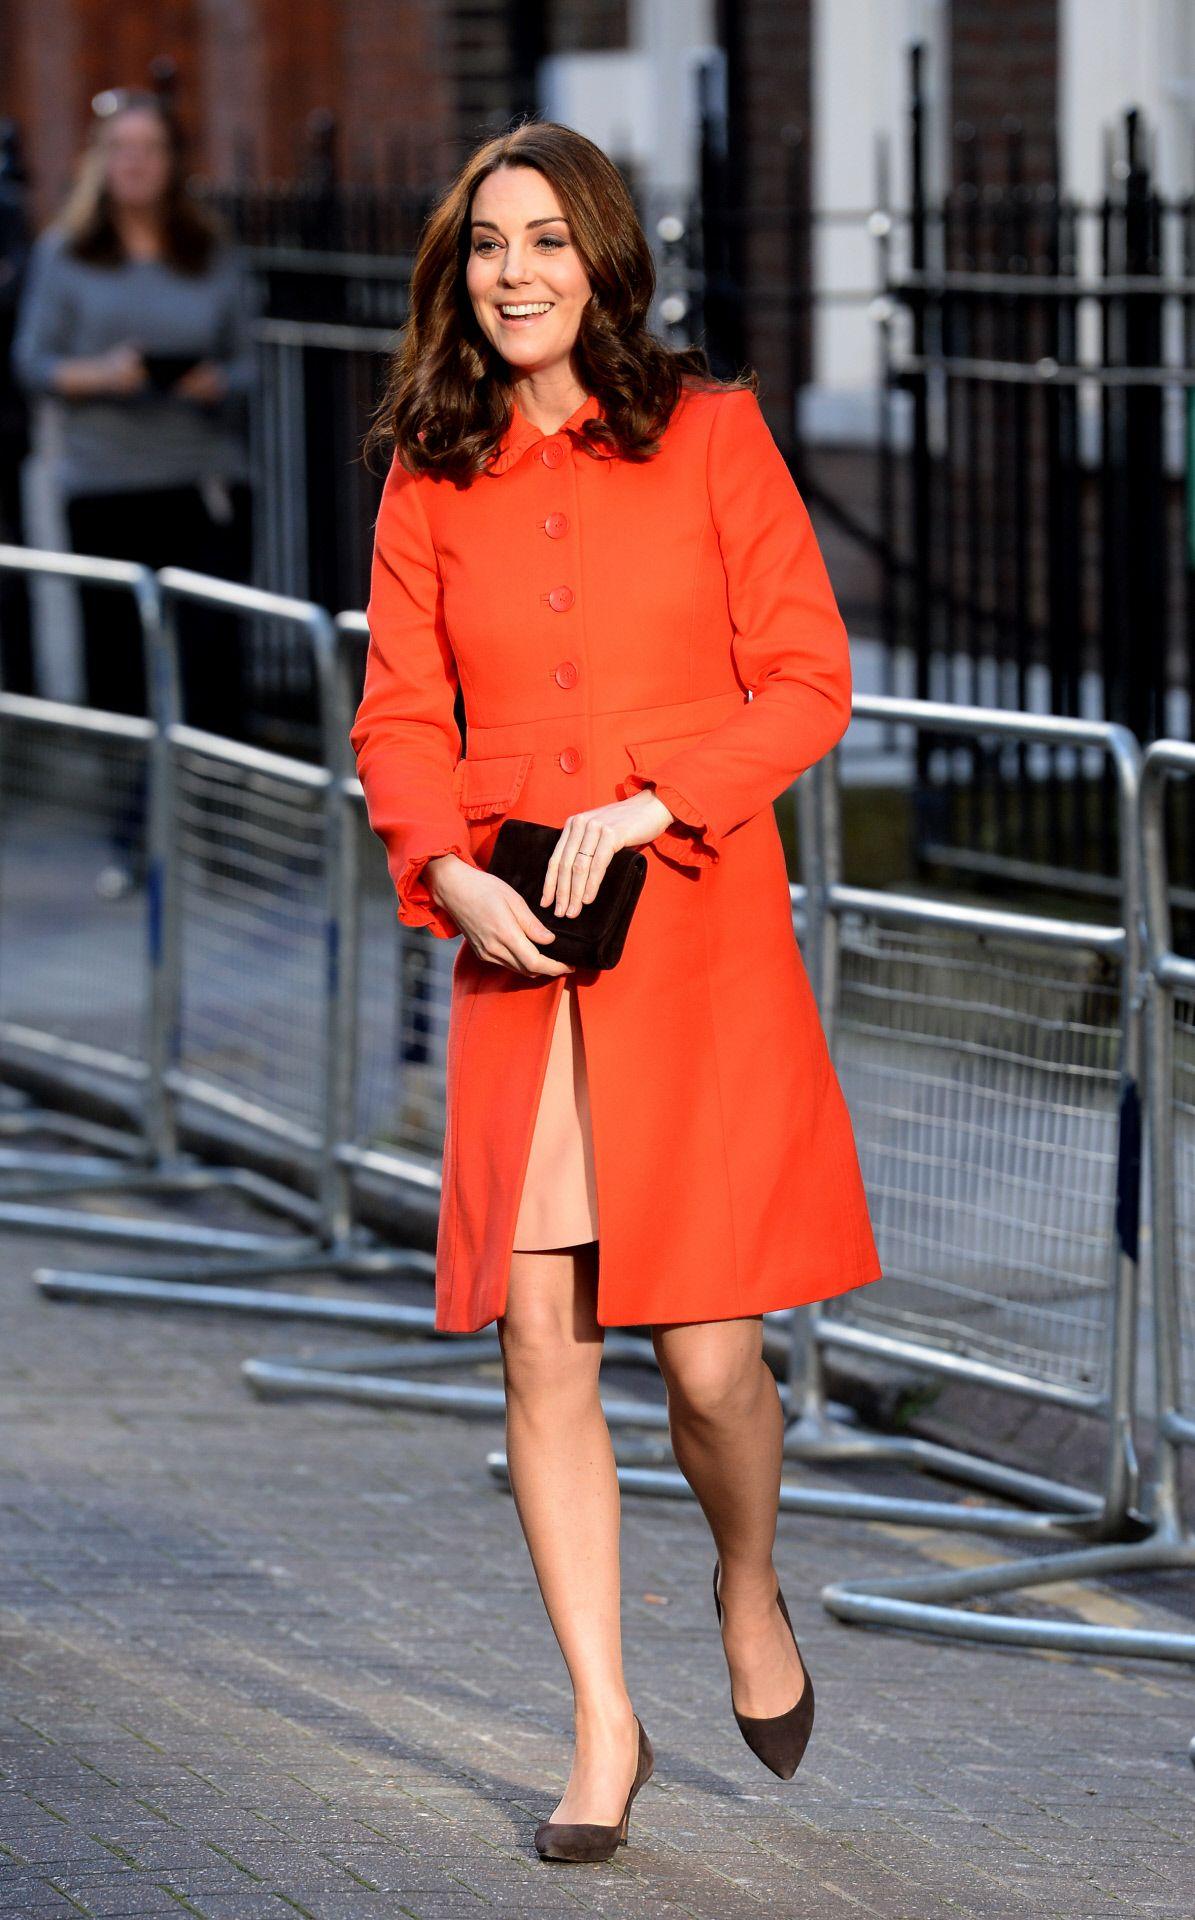 Cappotto Zara Zara Cappotto Middleton Kate Middleton Kate Zara Kate Cappotto edroWxCB